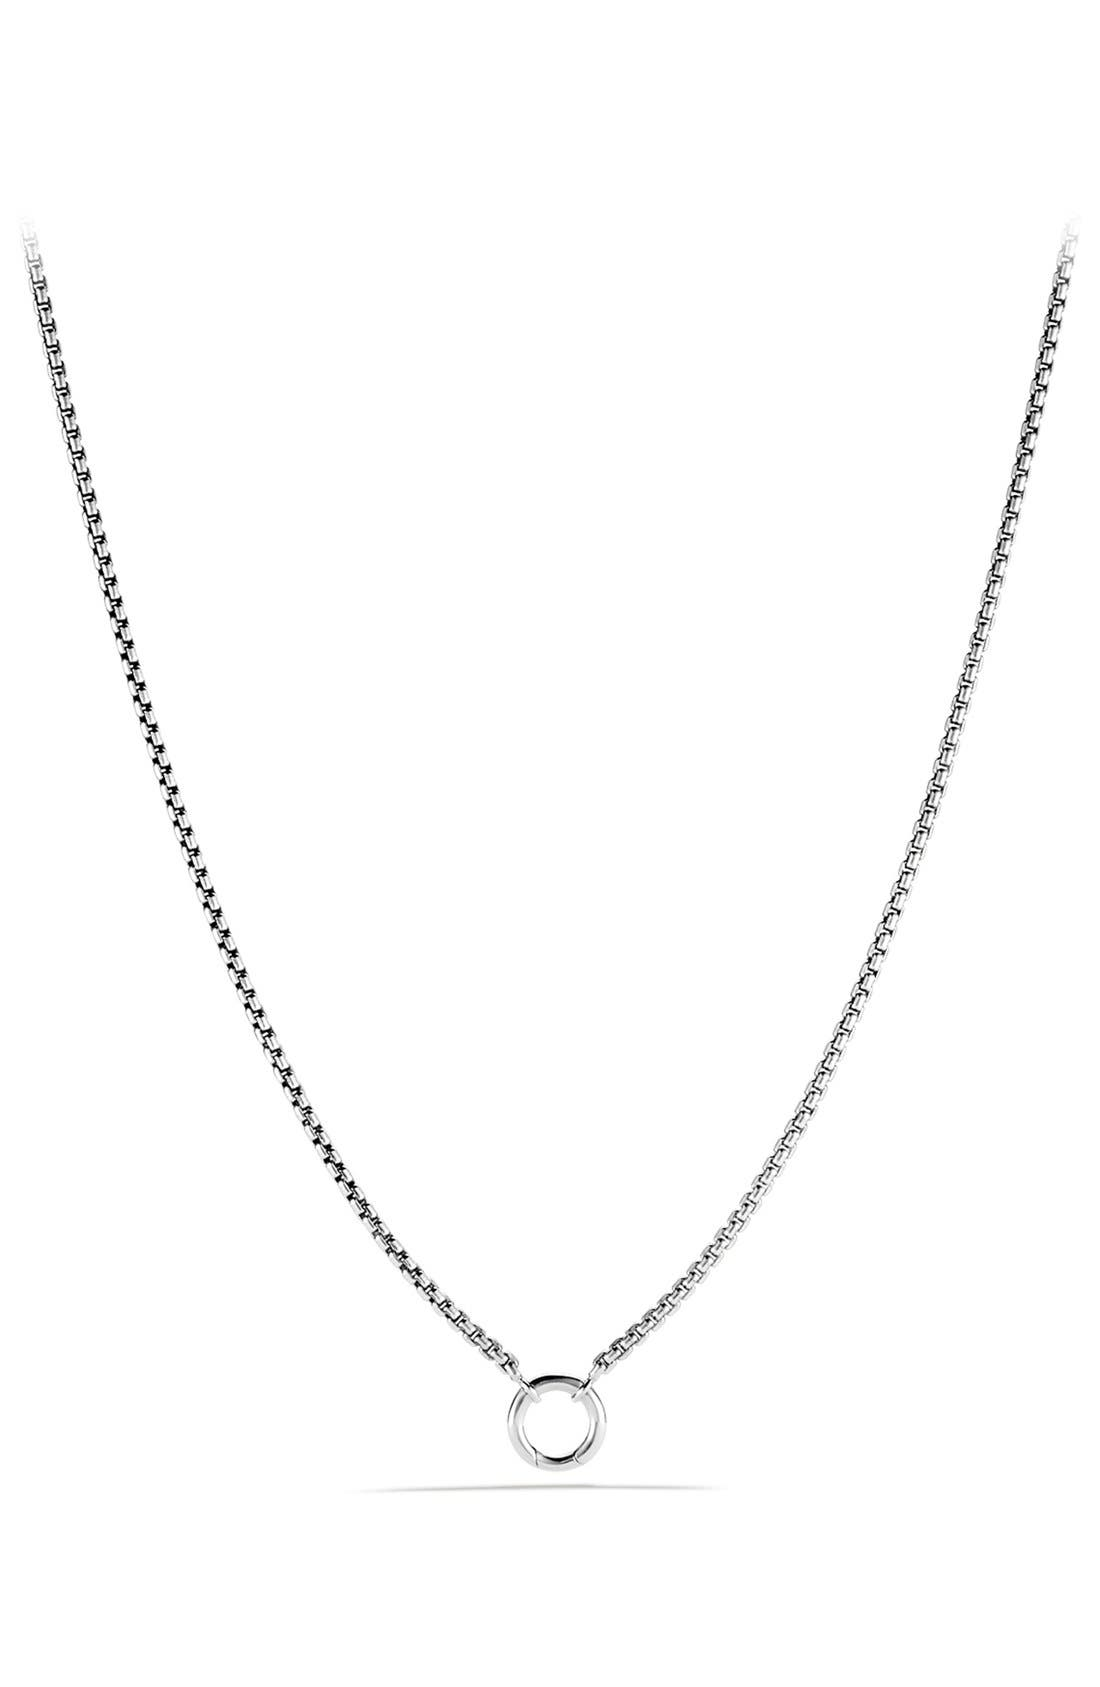 Main Image - David Yurman 'Chain' Charm Chain Necklace